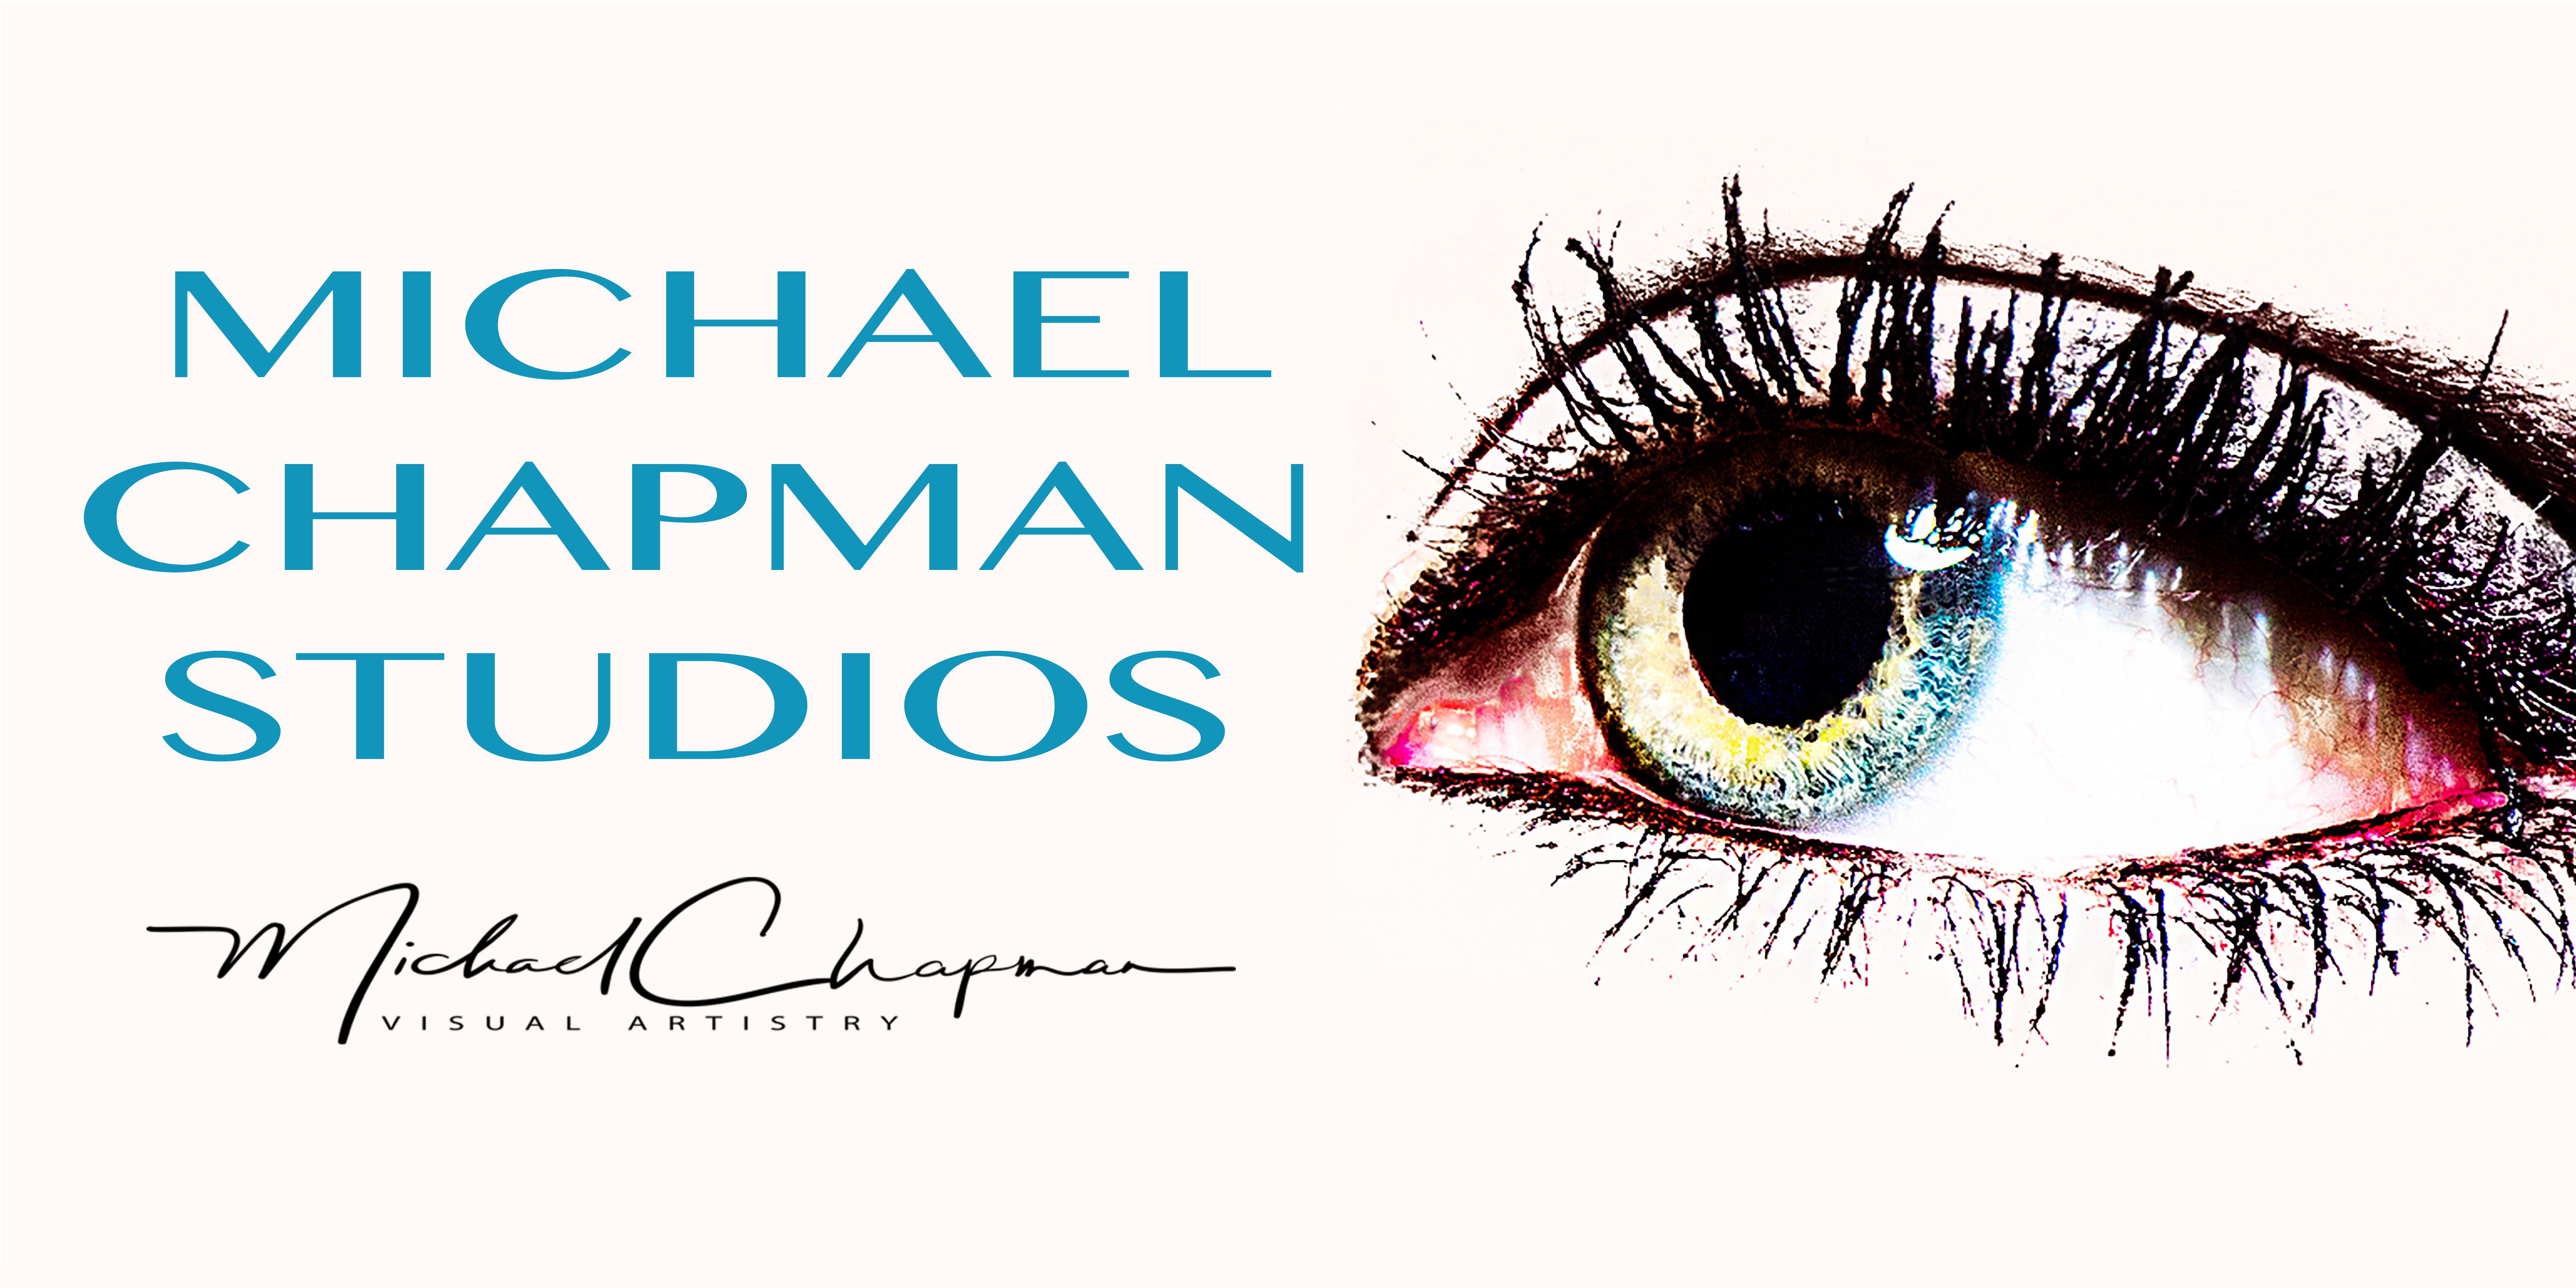 Michael Chapman Studios